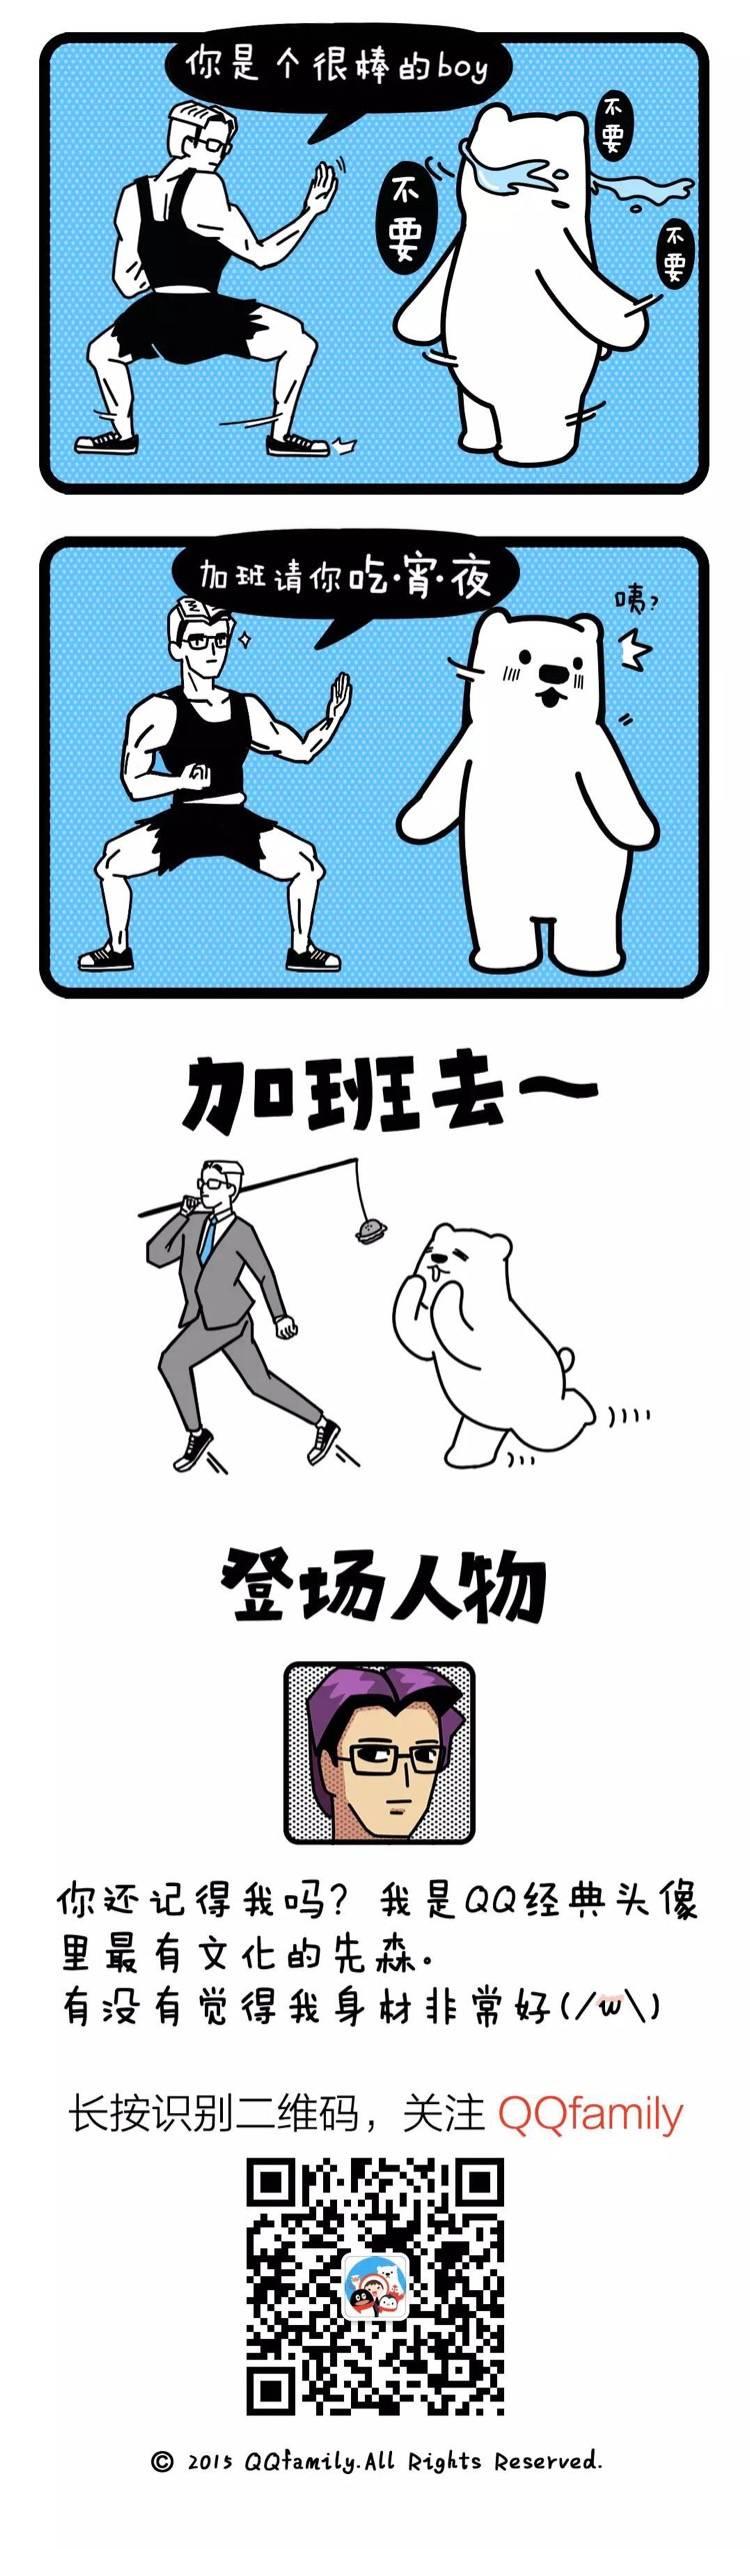 QQ-cartoon